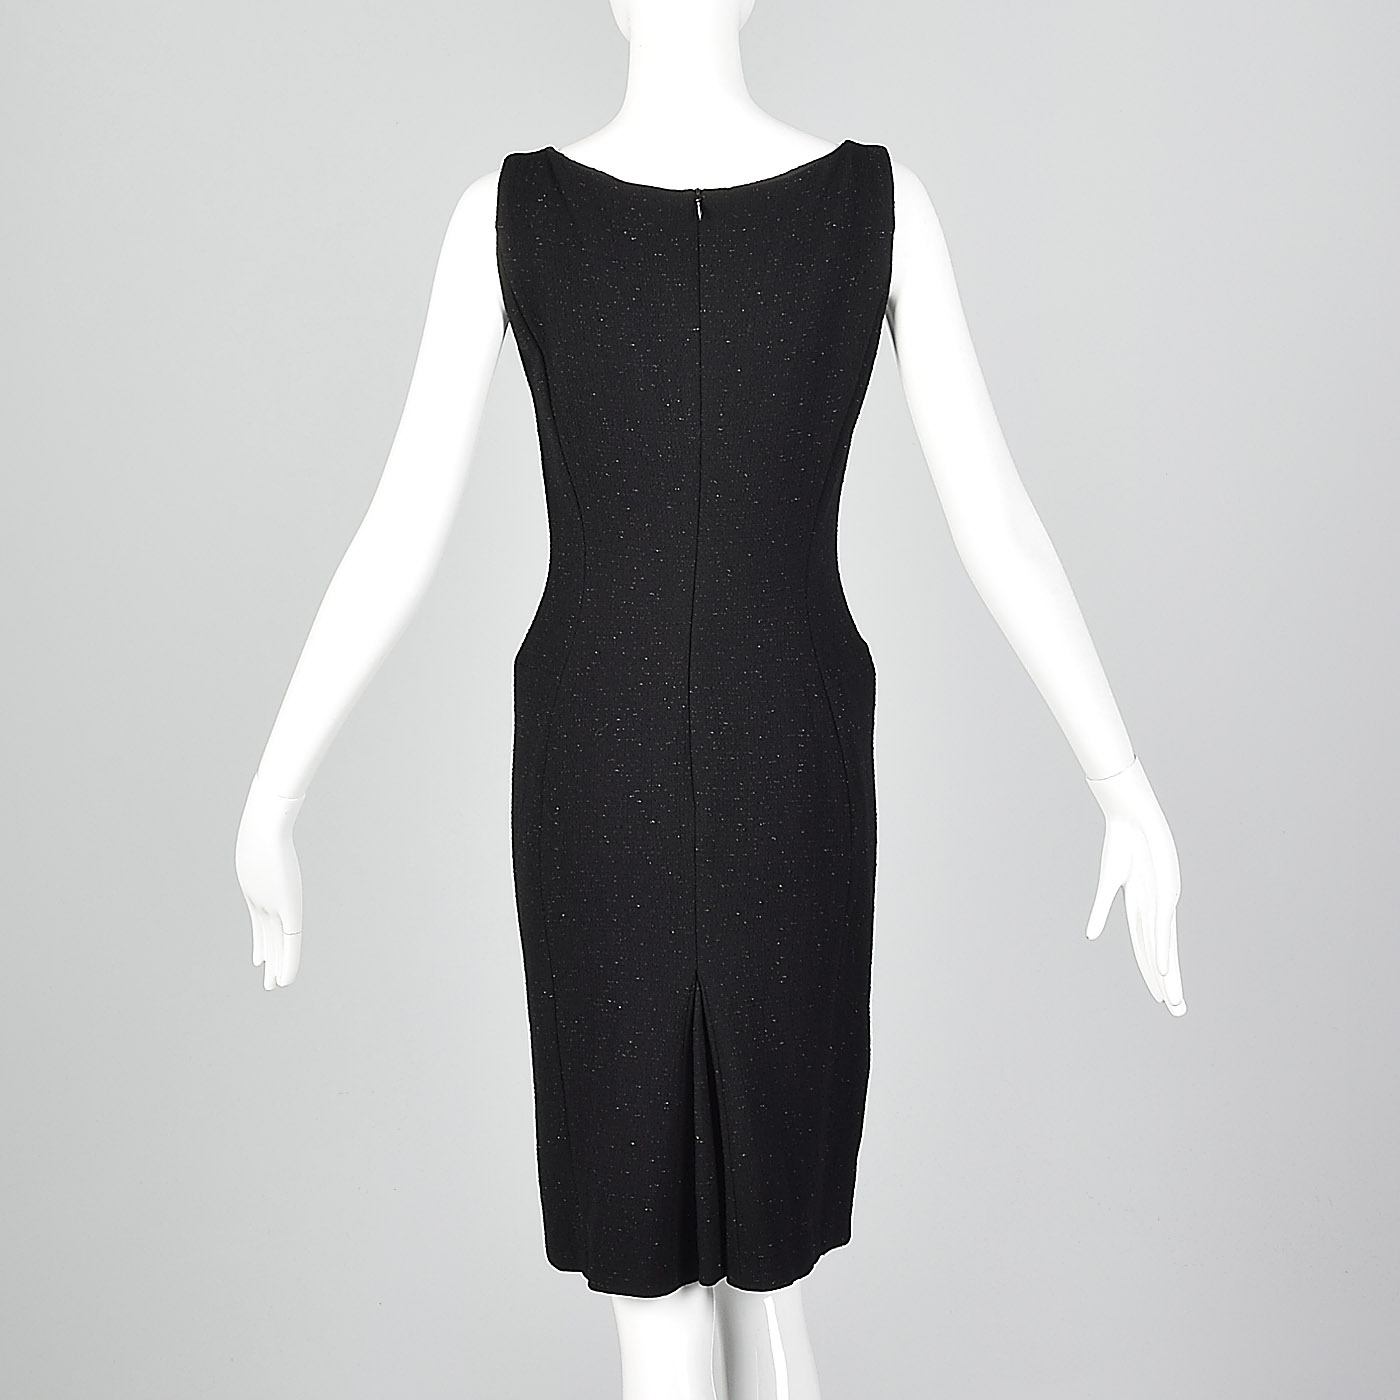 1c390f5767c3 M Moschino Cheap & Chic Tight Black Pencil Dress Lurex LBD Cocktail ...